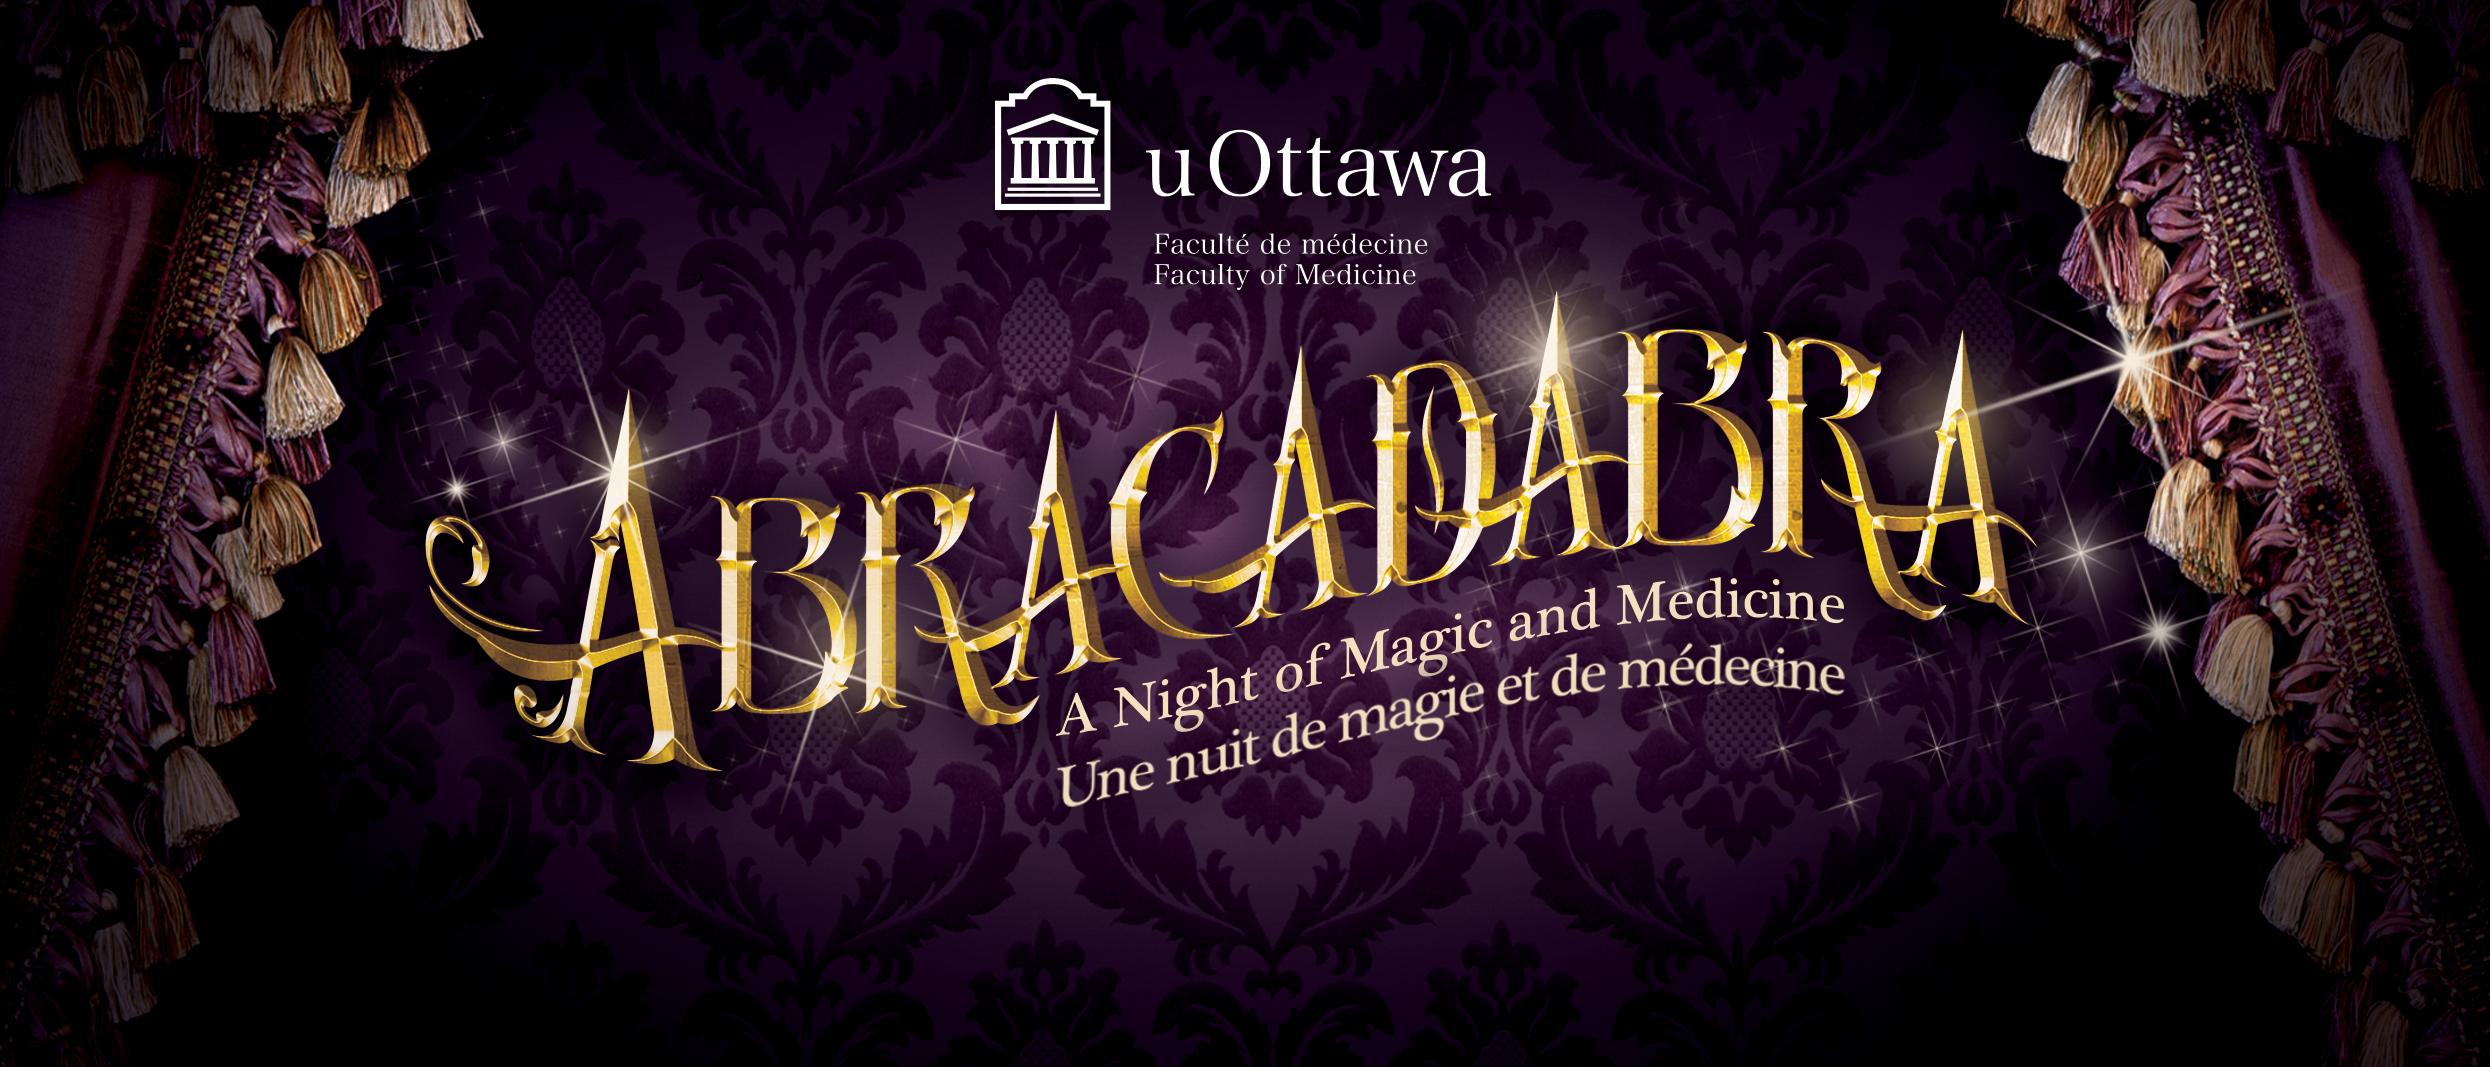 Abracadabra: A Night of Magic & Medicine 2017 banner